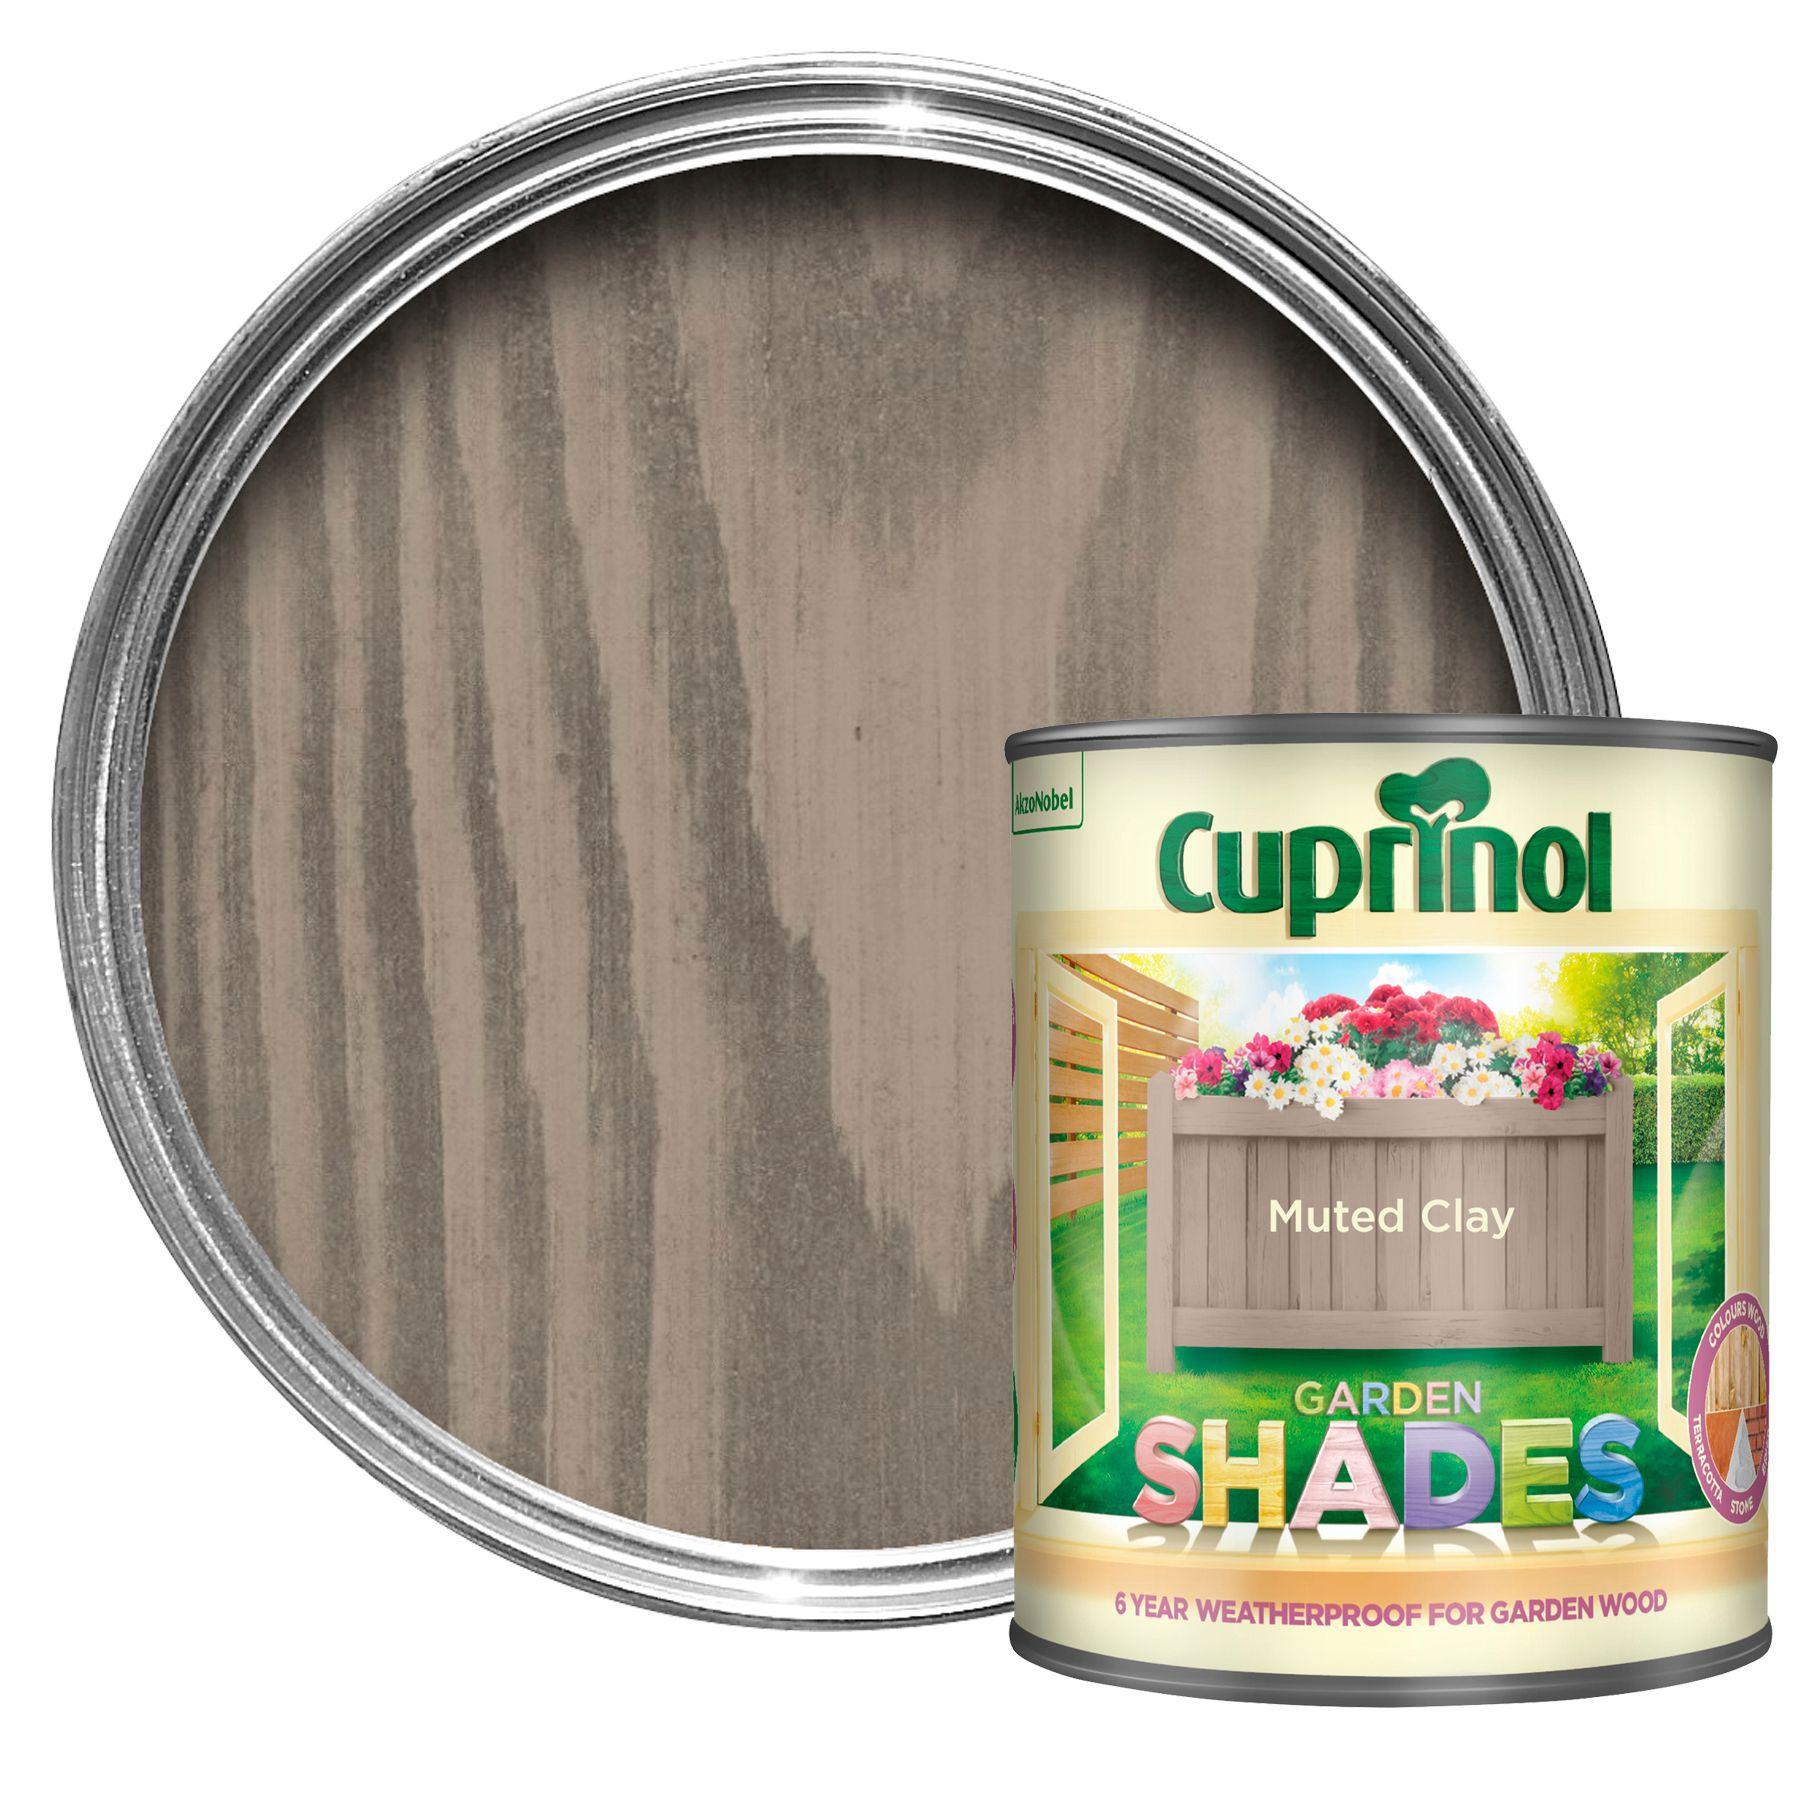 Cuprinol Garden Shades Muted Clay Matt Wood Paint 1l